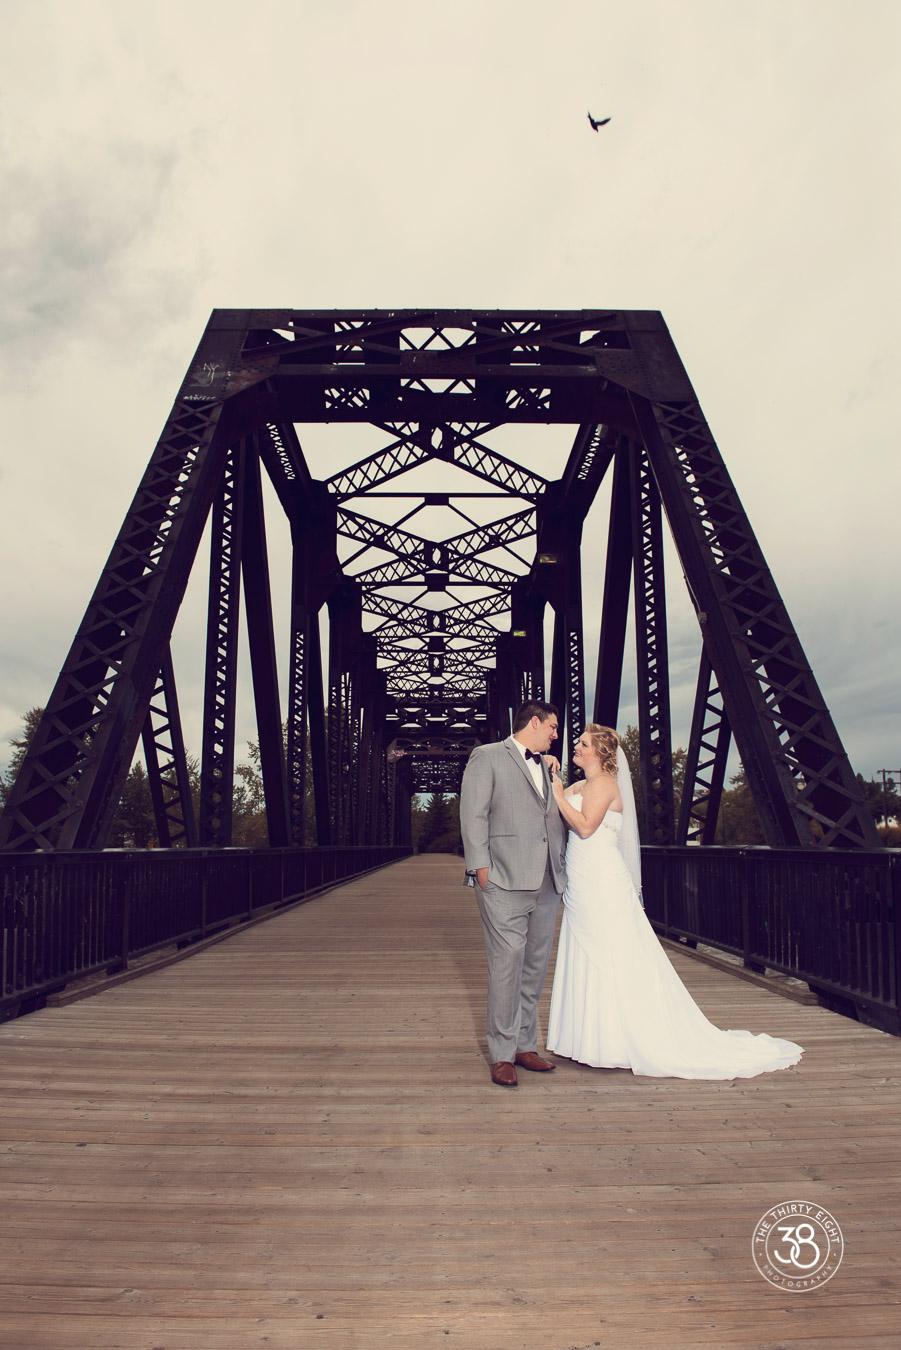 The38Photo_wedding_day_Calgary_17.jpg